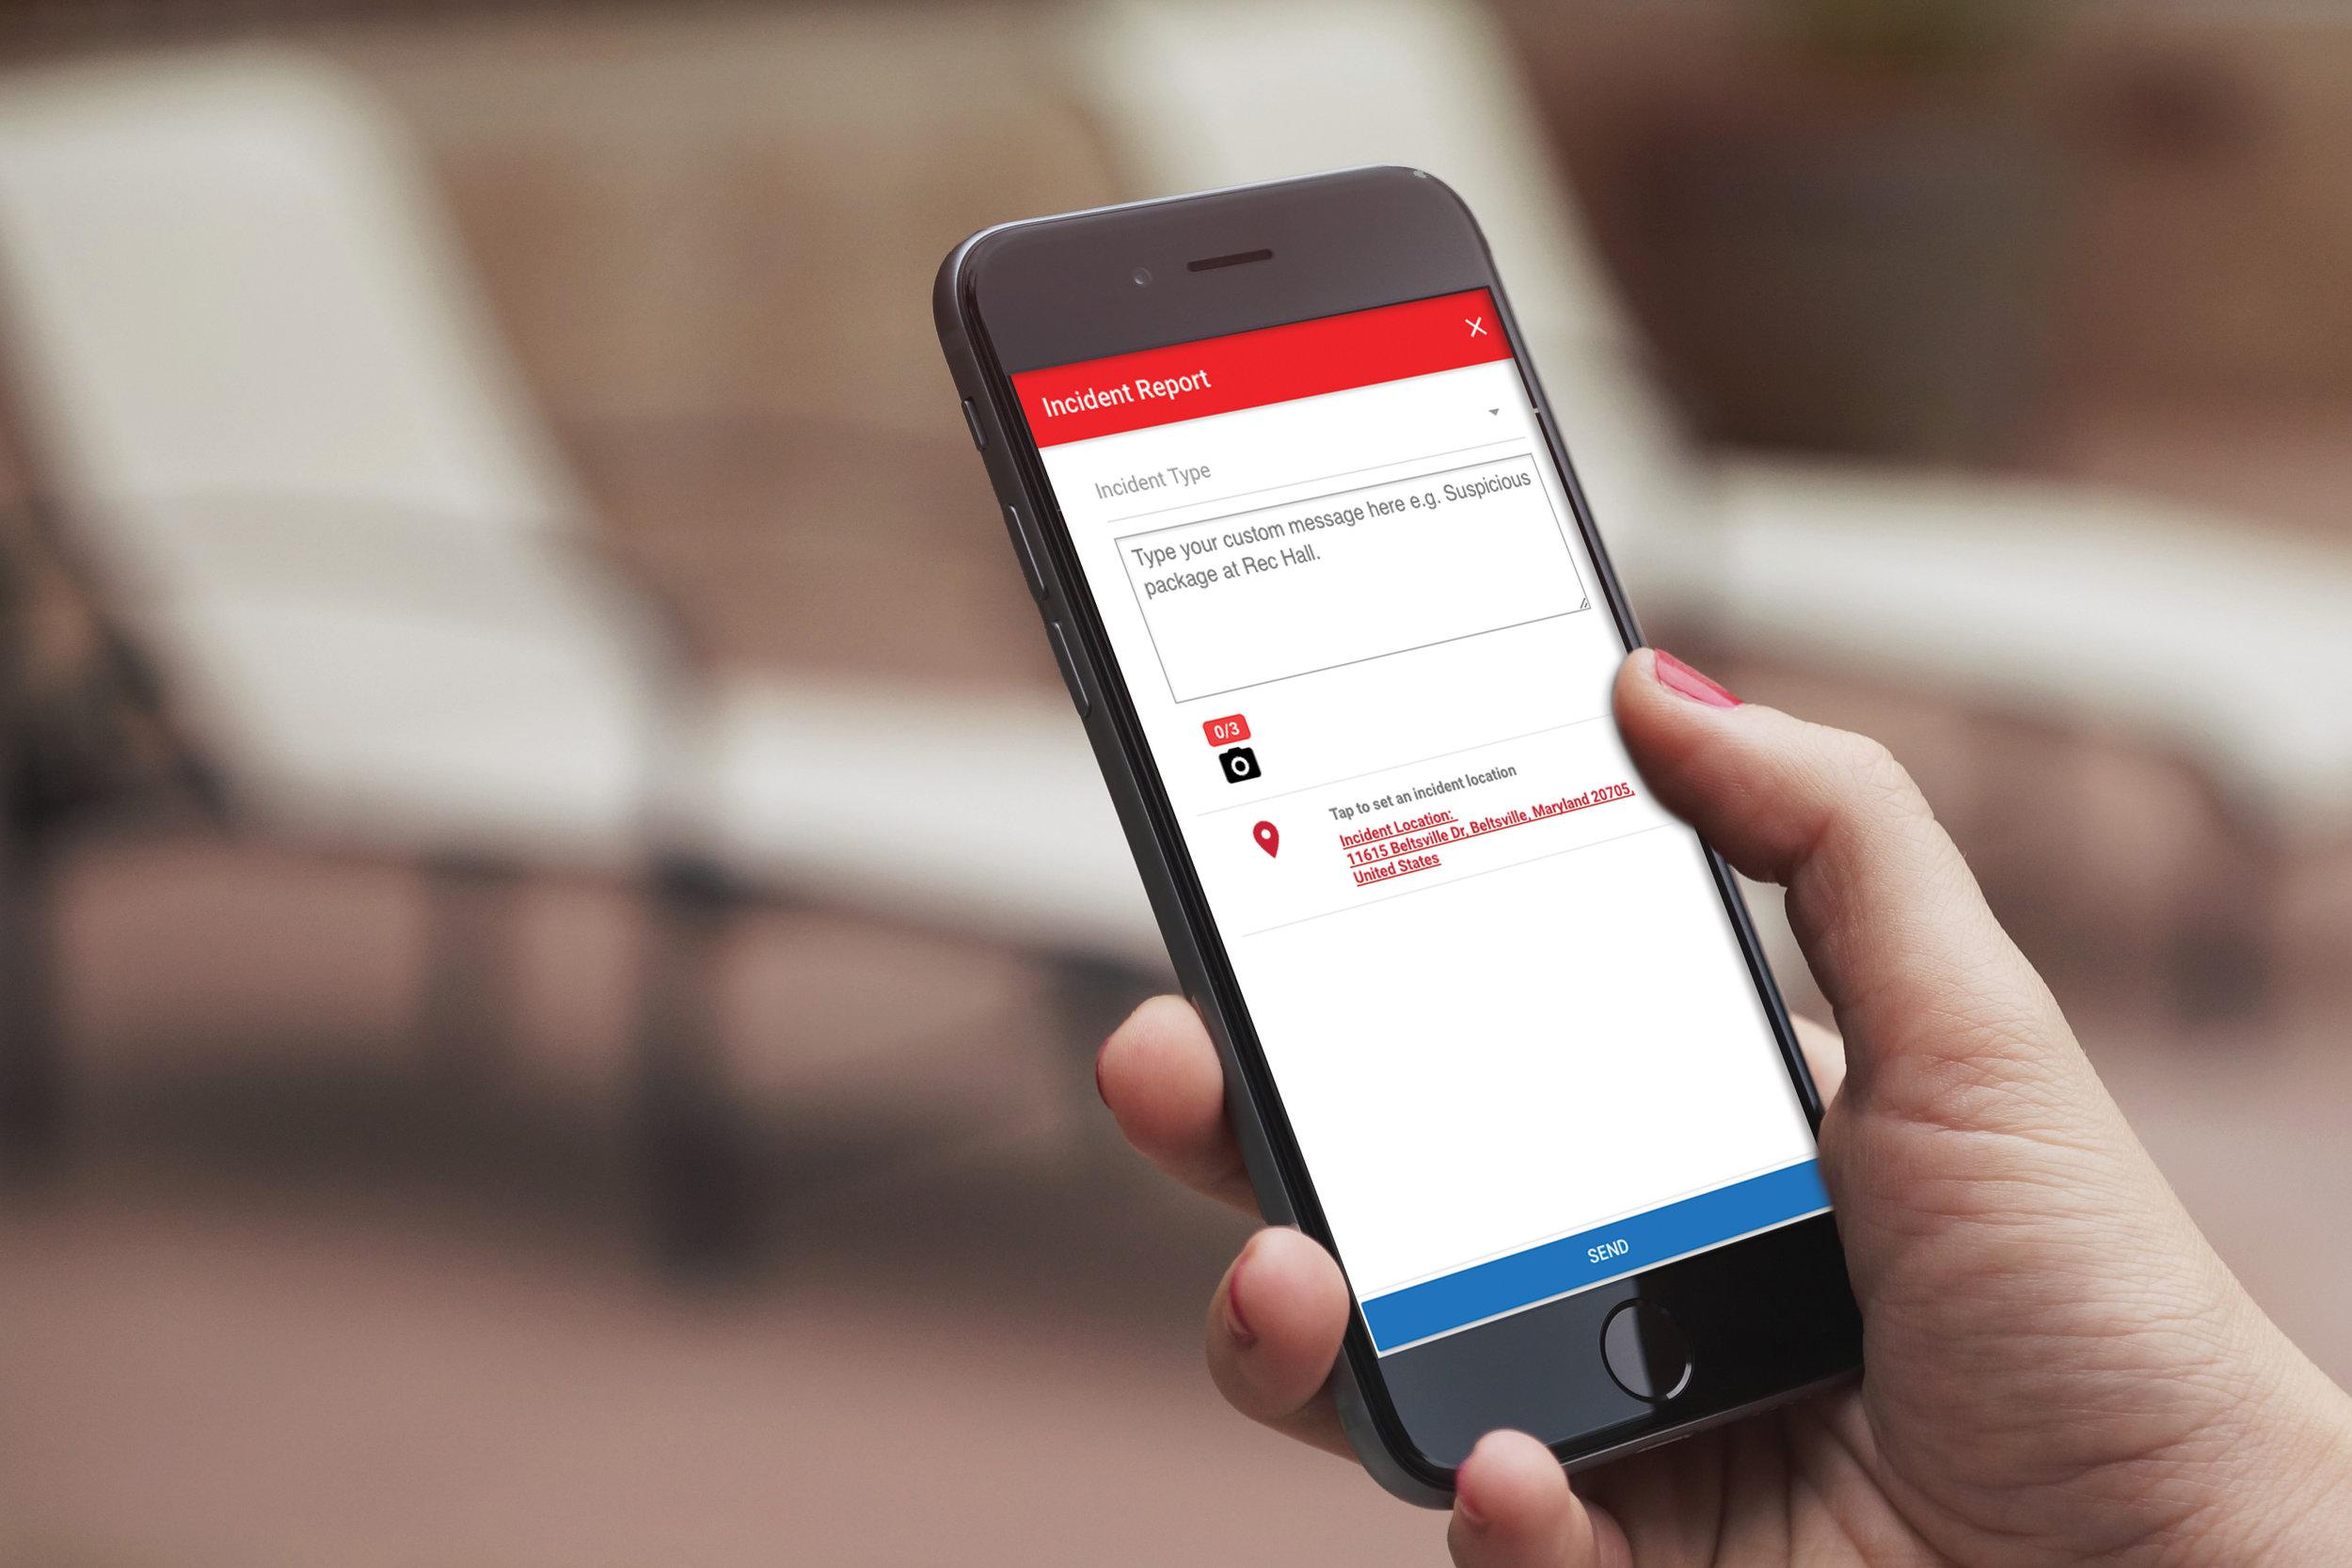 mobile_app_recipient_phone_2017_high_res.jpg